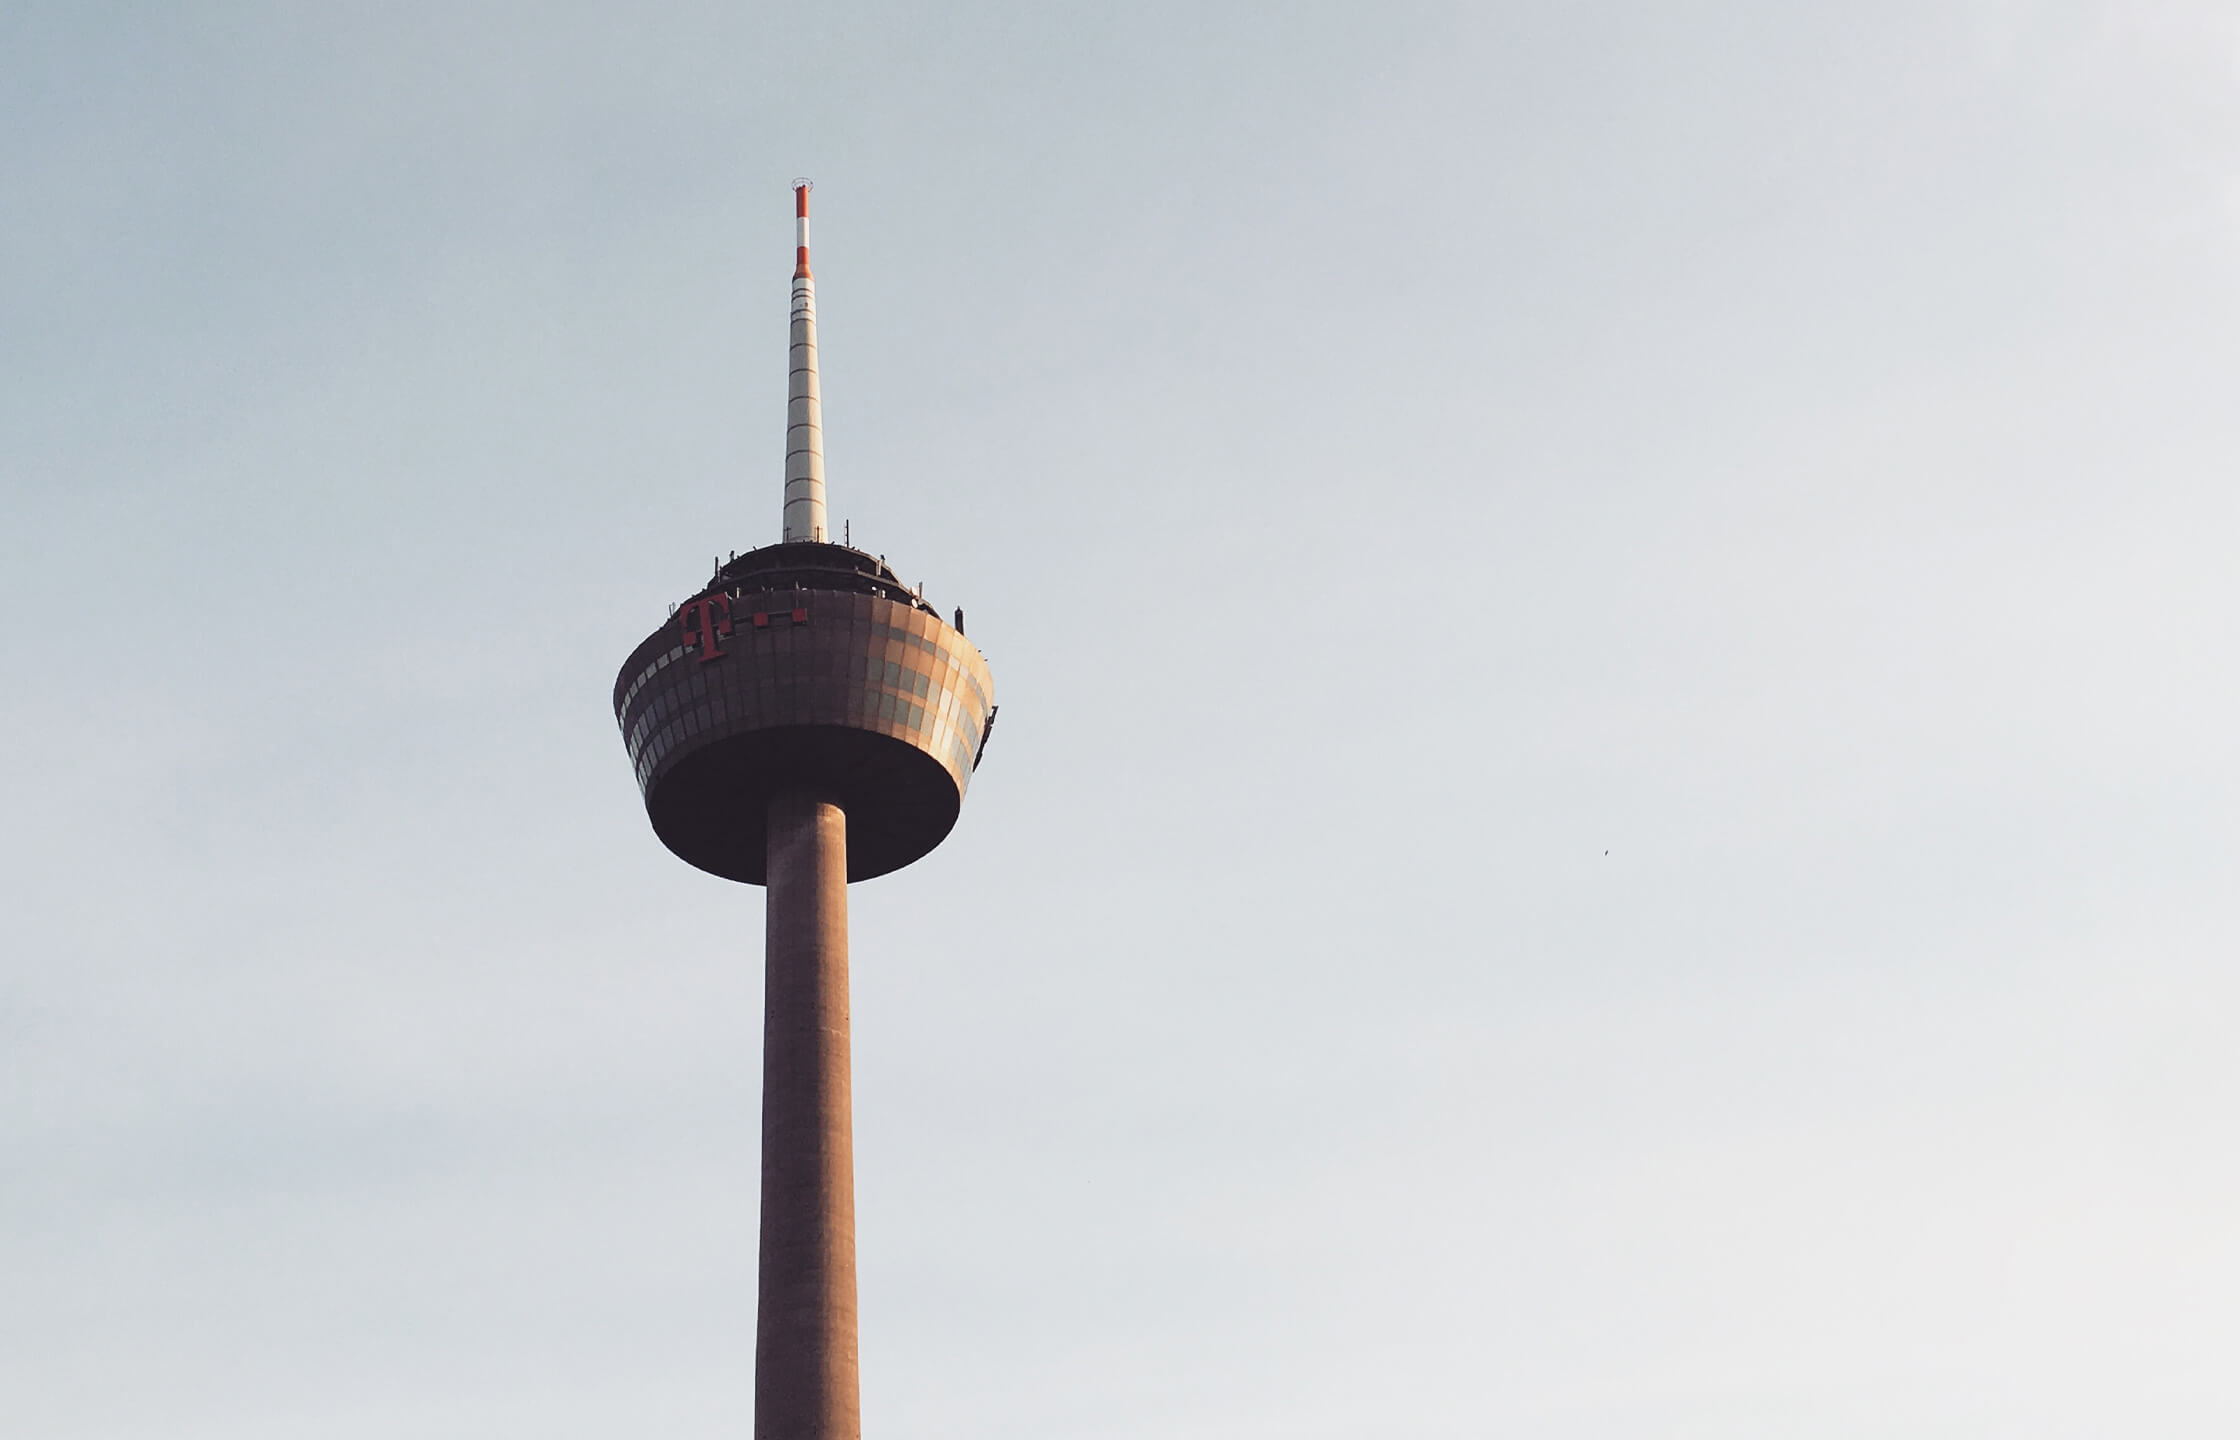 Kölner Fernsehturm